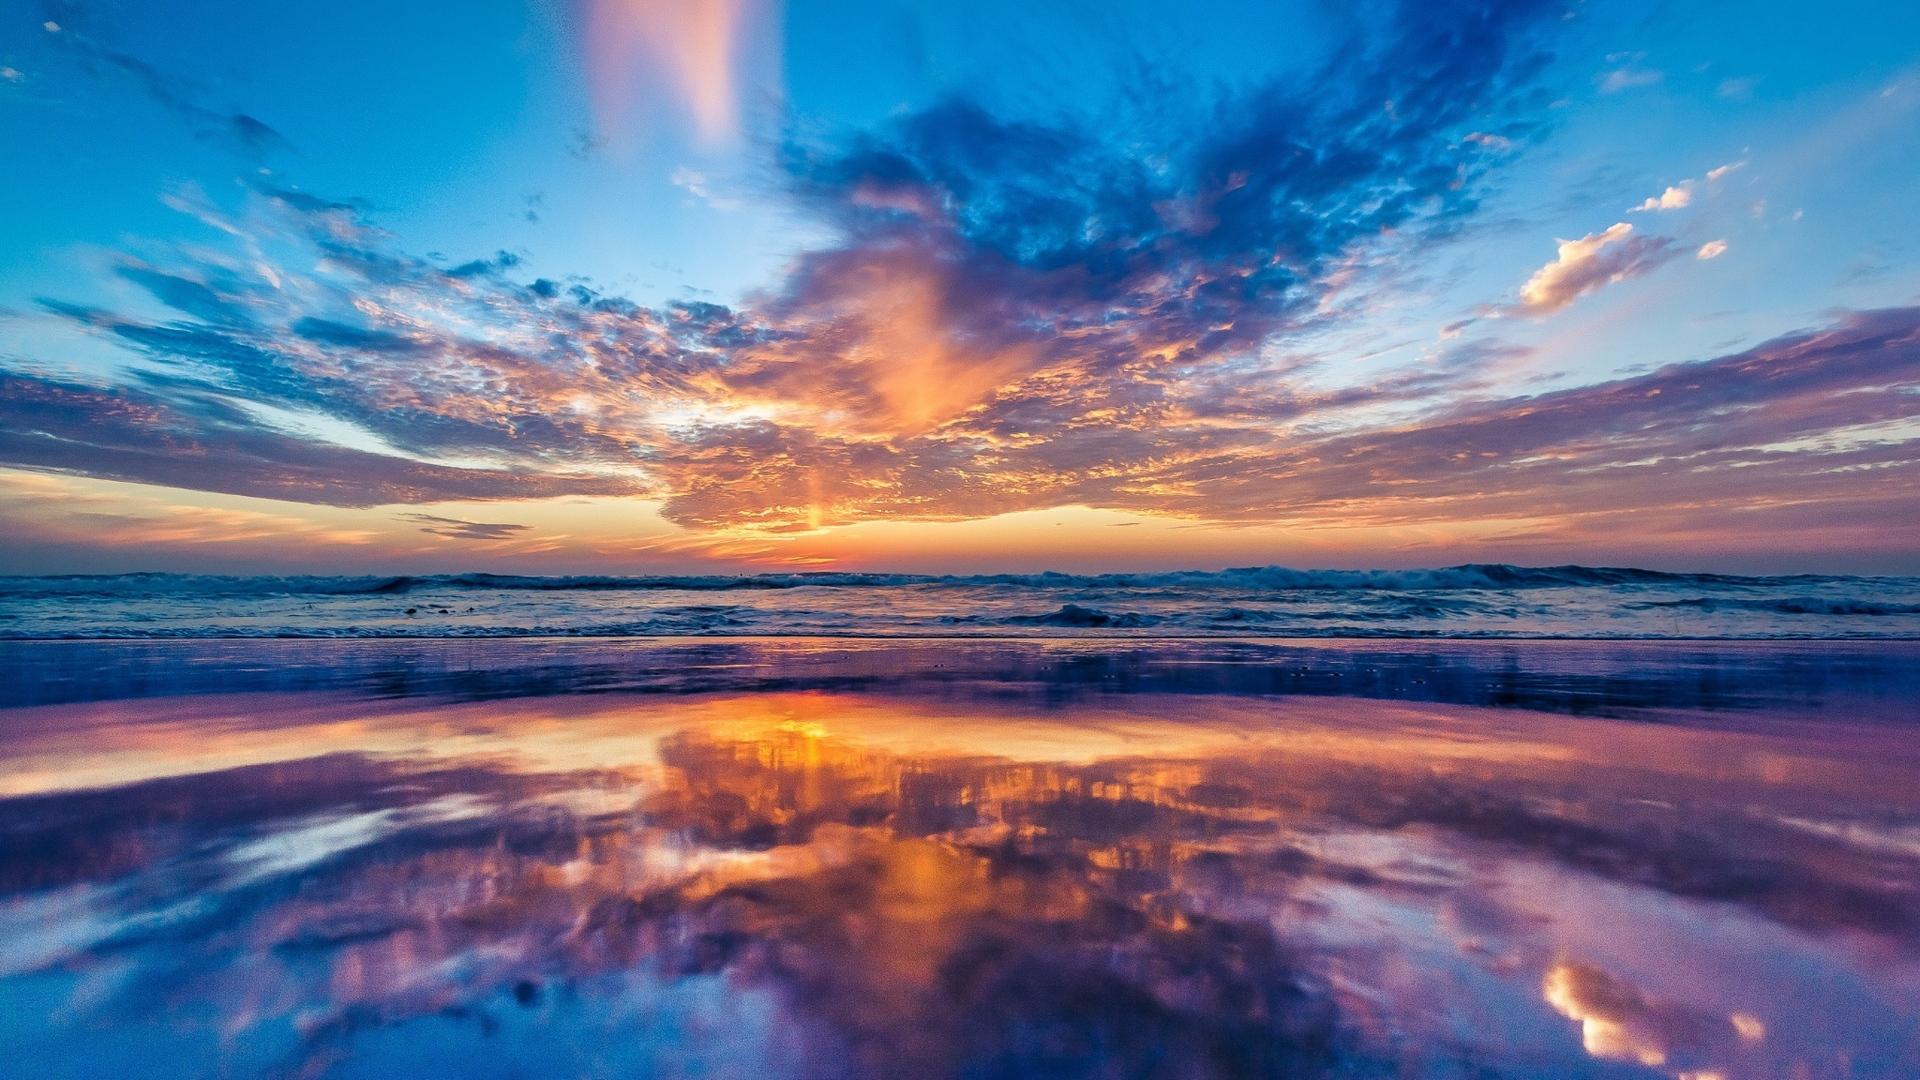 1920x1080 ocean sky sunset